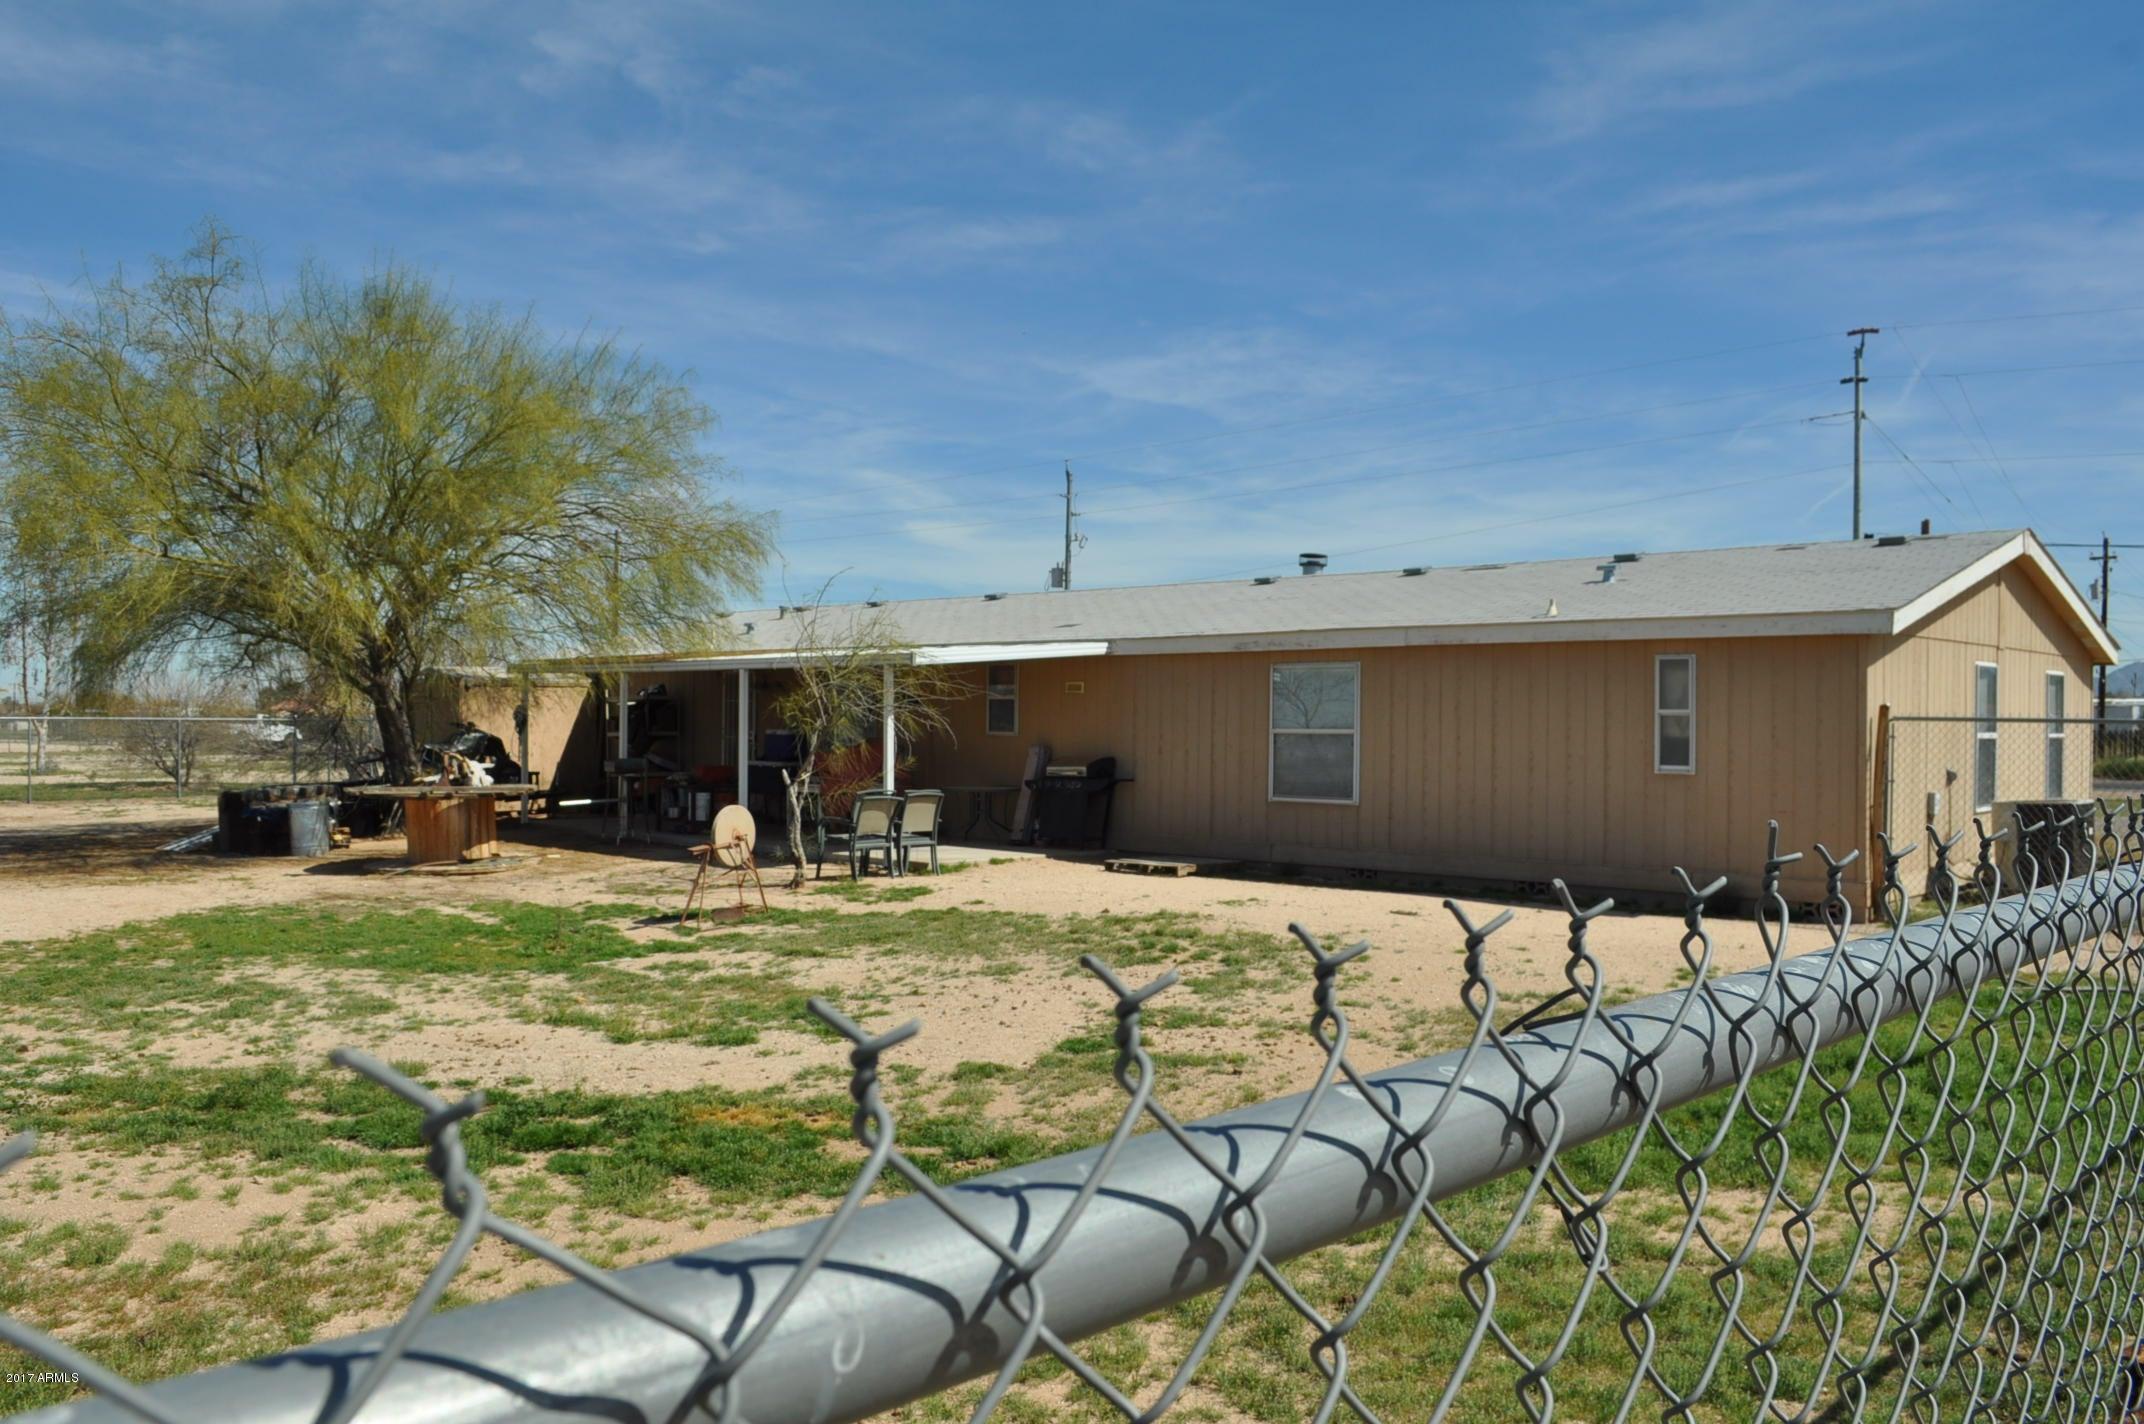 MLS 5576835 13912 S TUTHILL Road, Buckeye, AZ 85326 Buckeye AZ REO Bank Owned Foreclosure